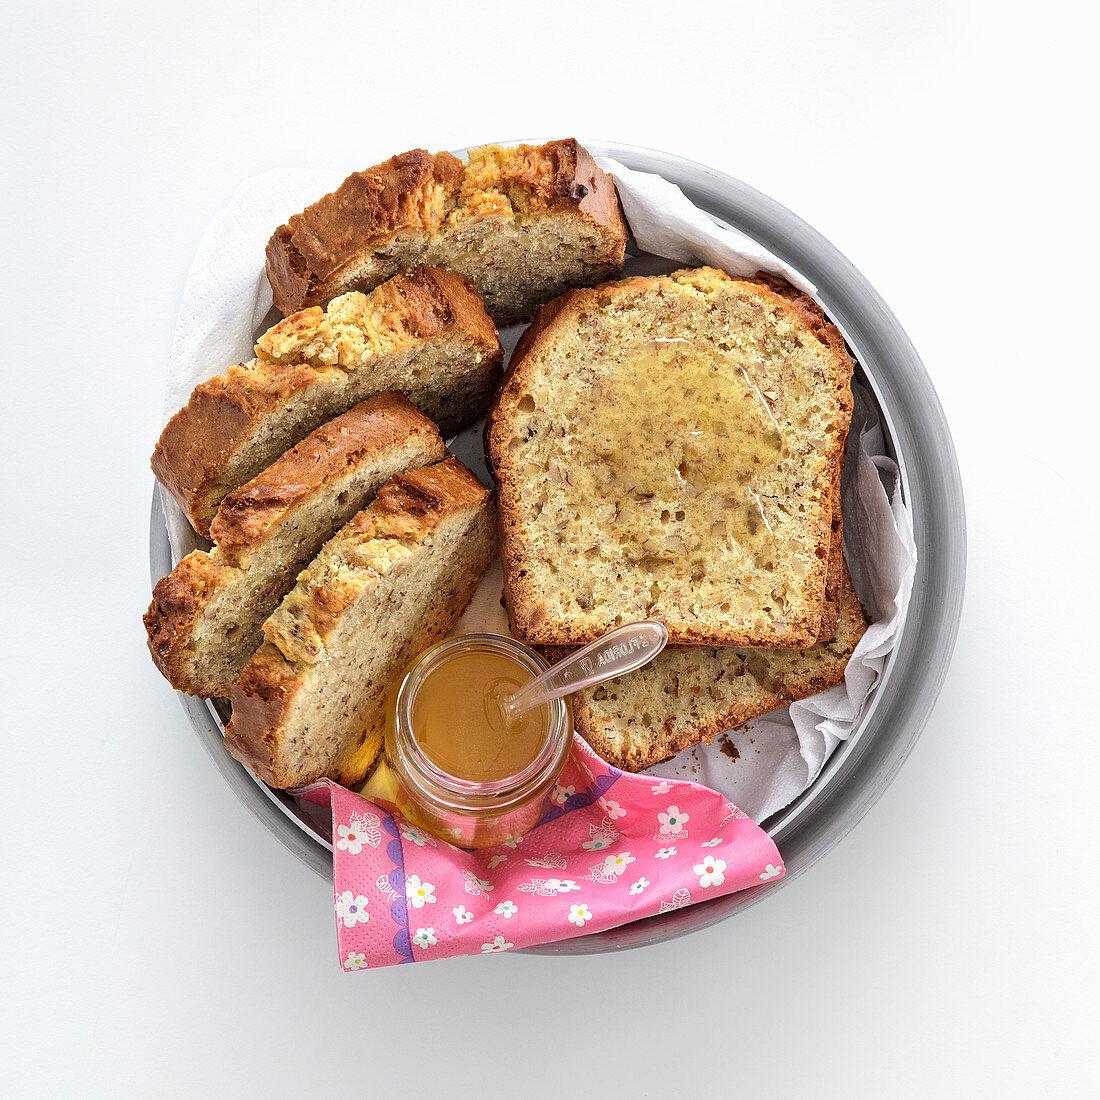 Almond cake with cardamom syrup